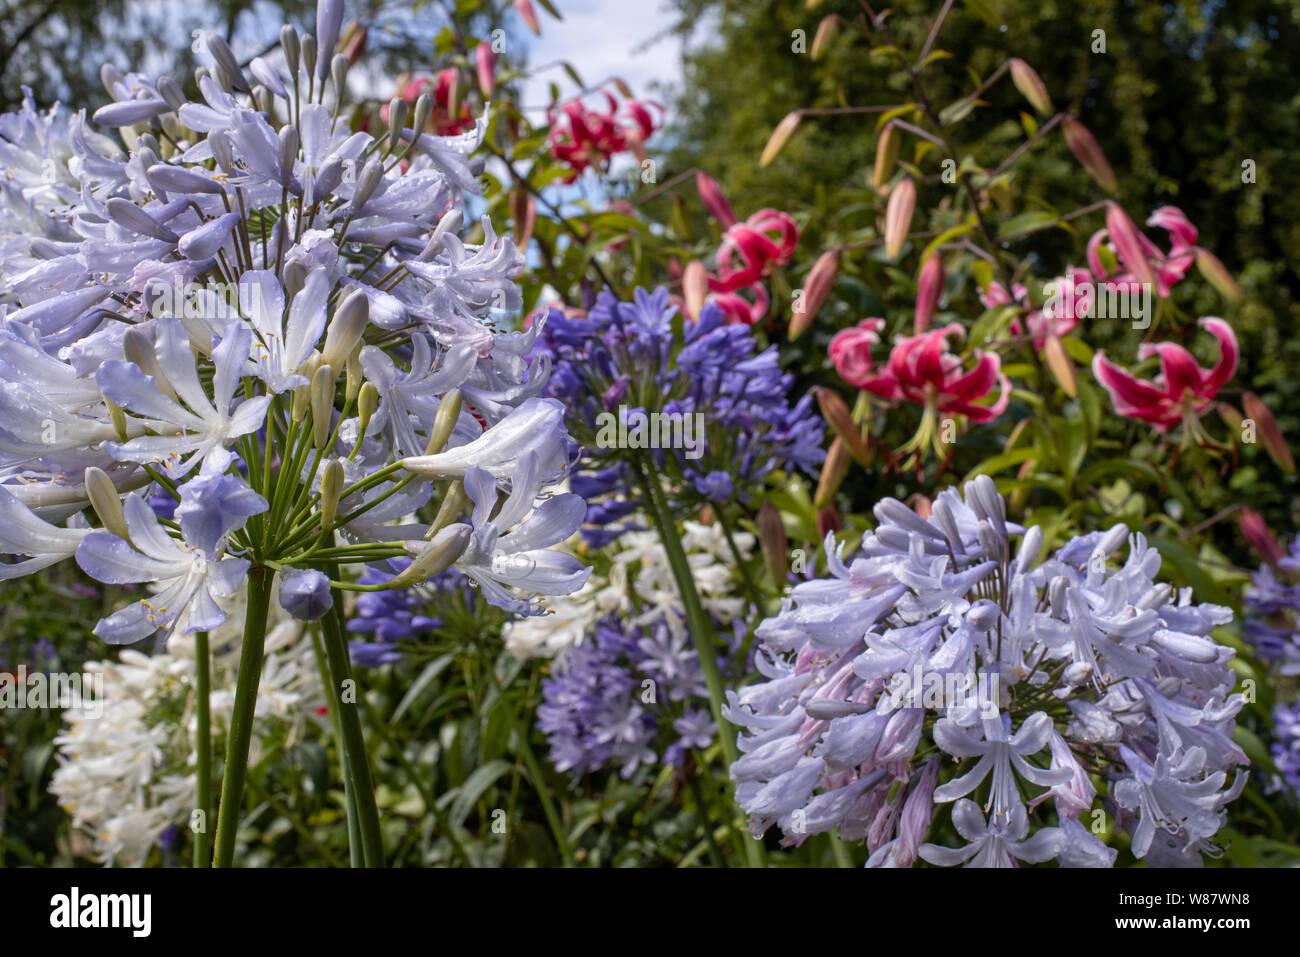 Flowering blue agapanthus in an English garden, Hampshire, UK Stock Photo